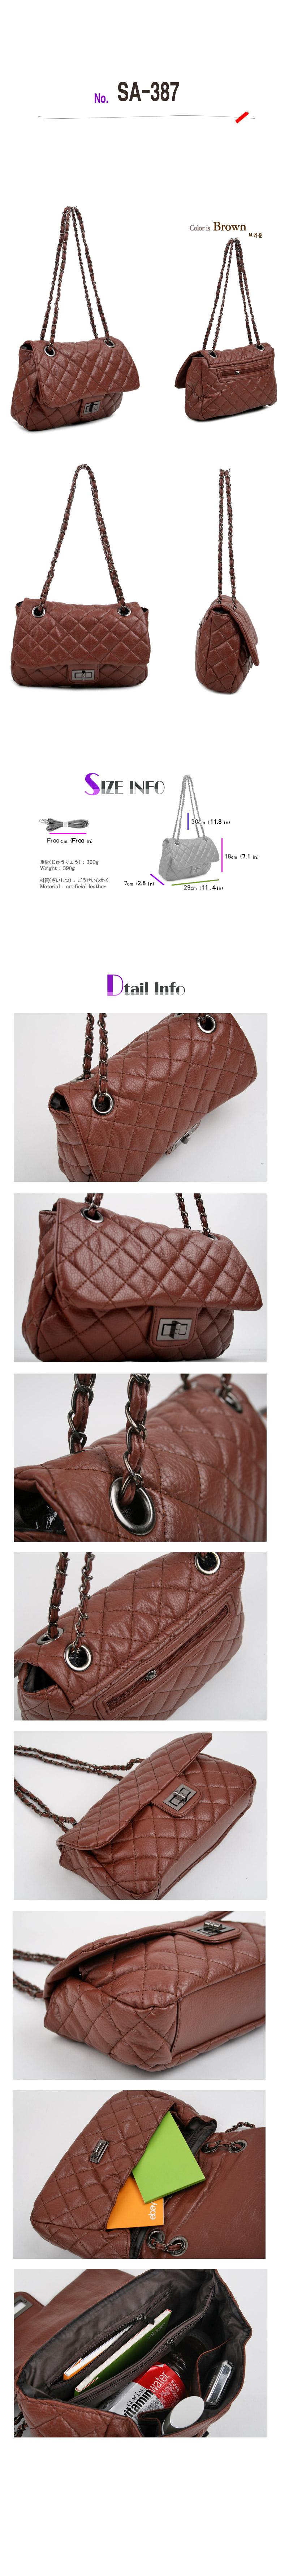 handbag no.SA-387view